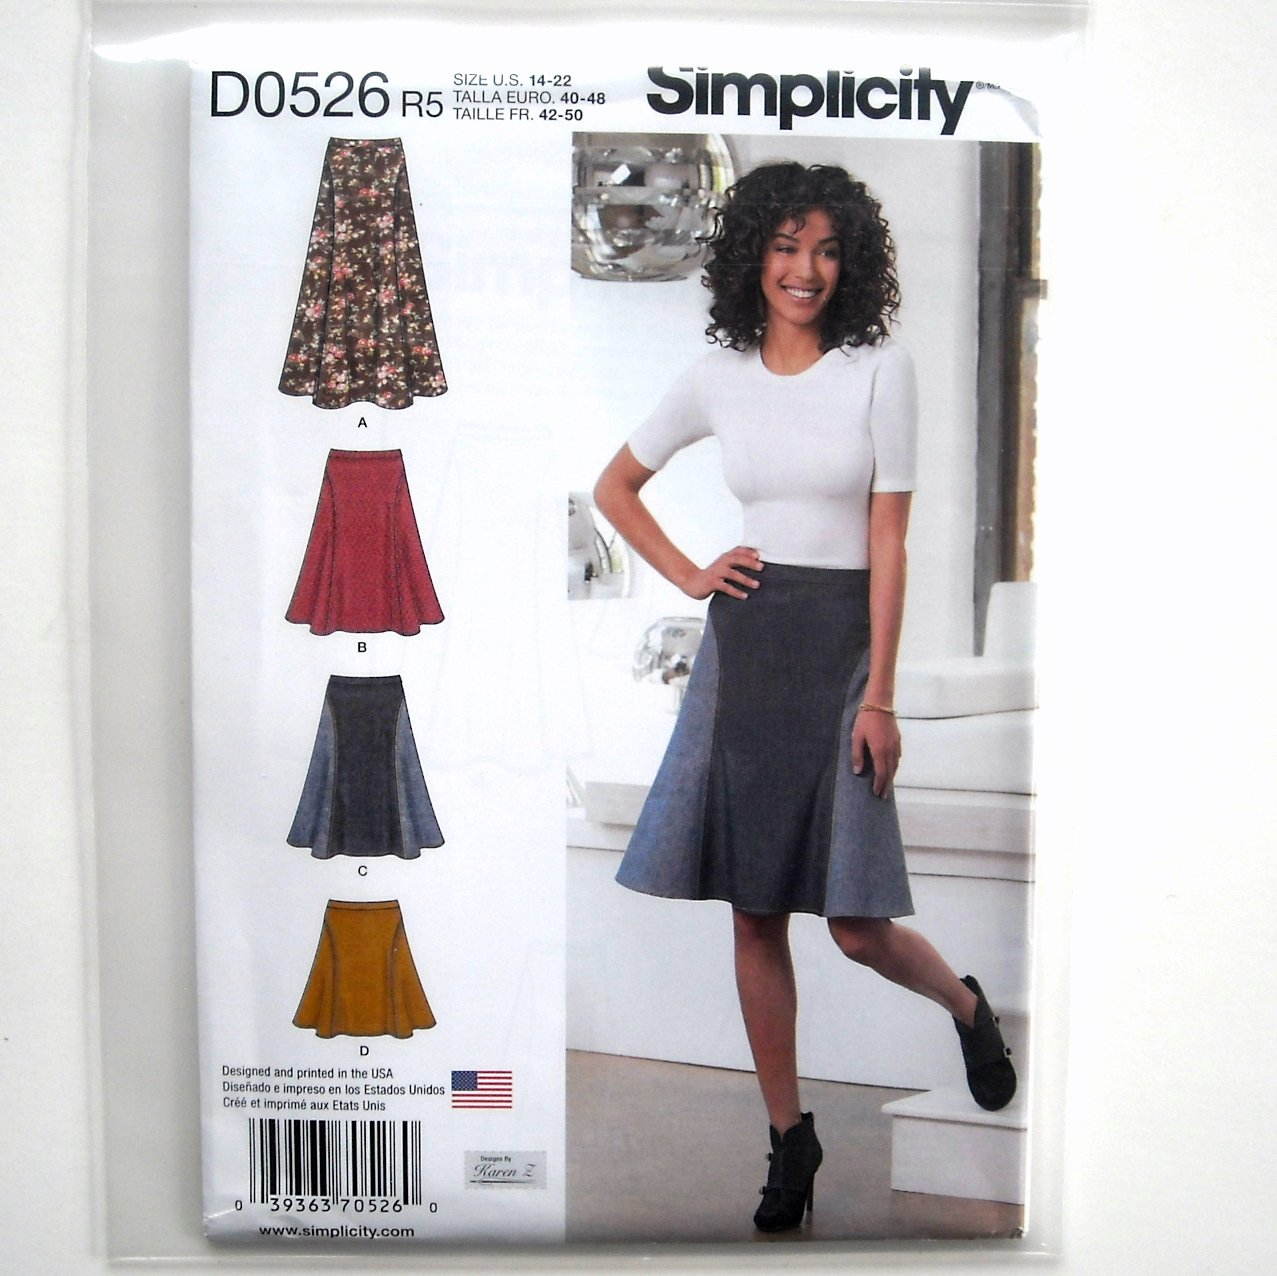 Misses Skirts 14 - 22 Design Karen Z Simplicity Sewing Pattern D0526